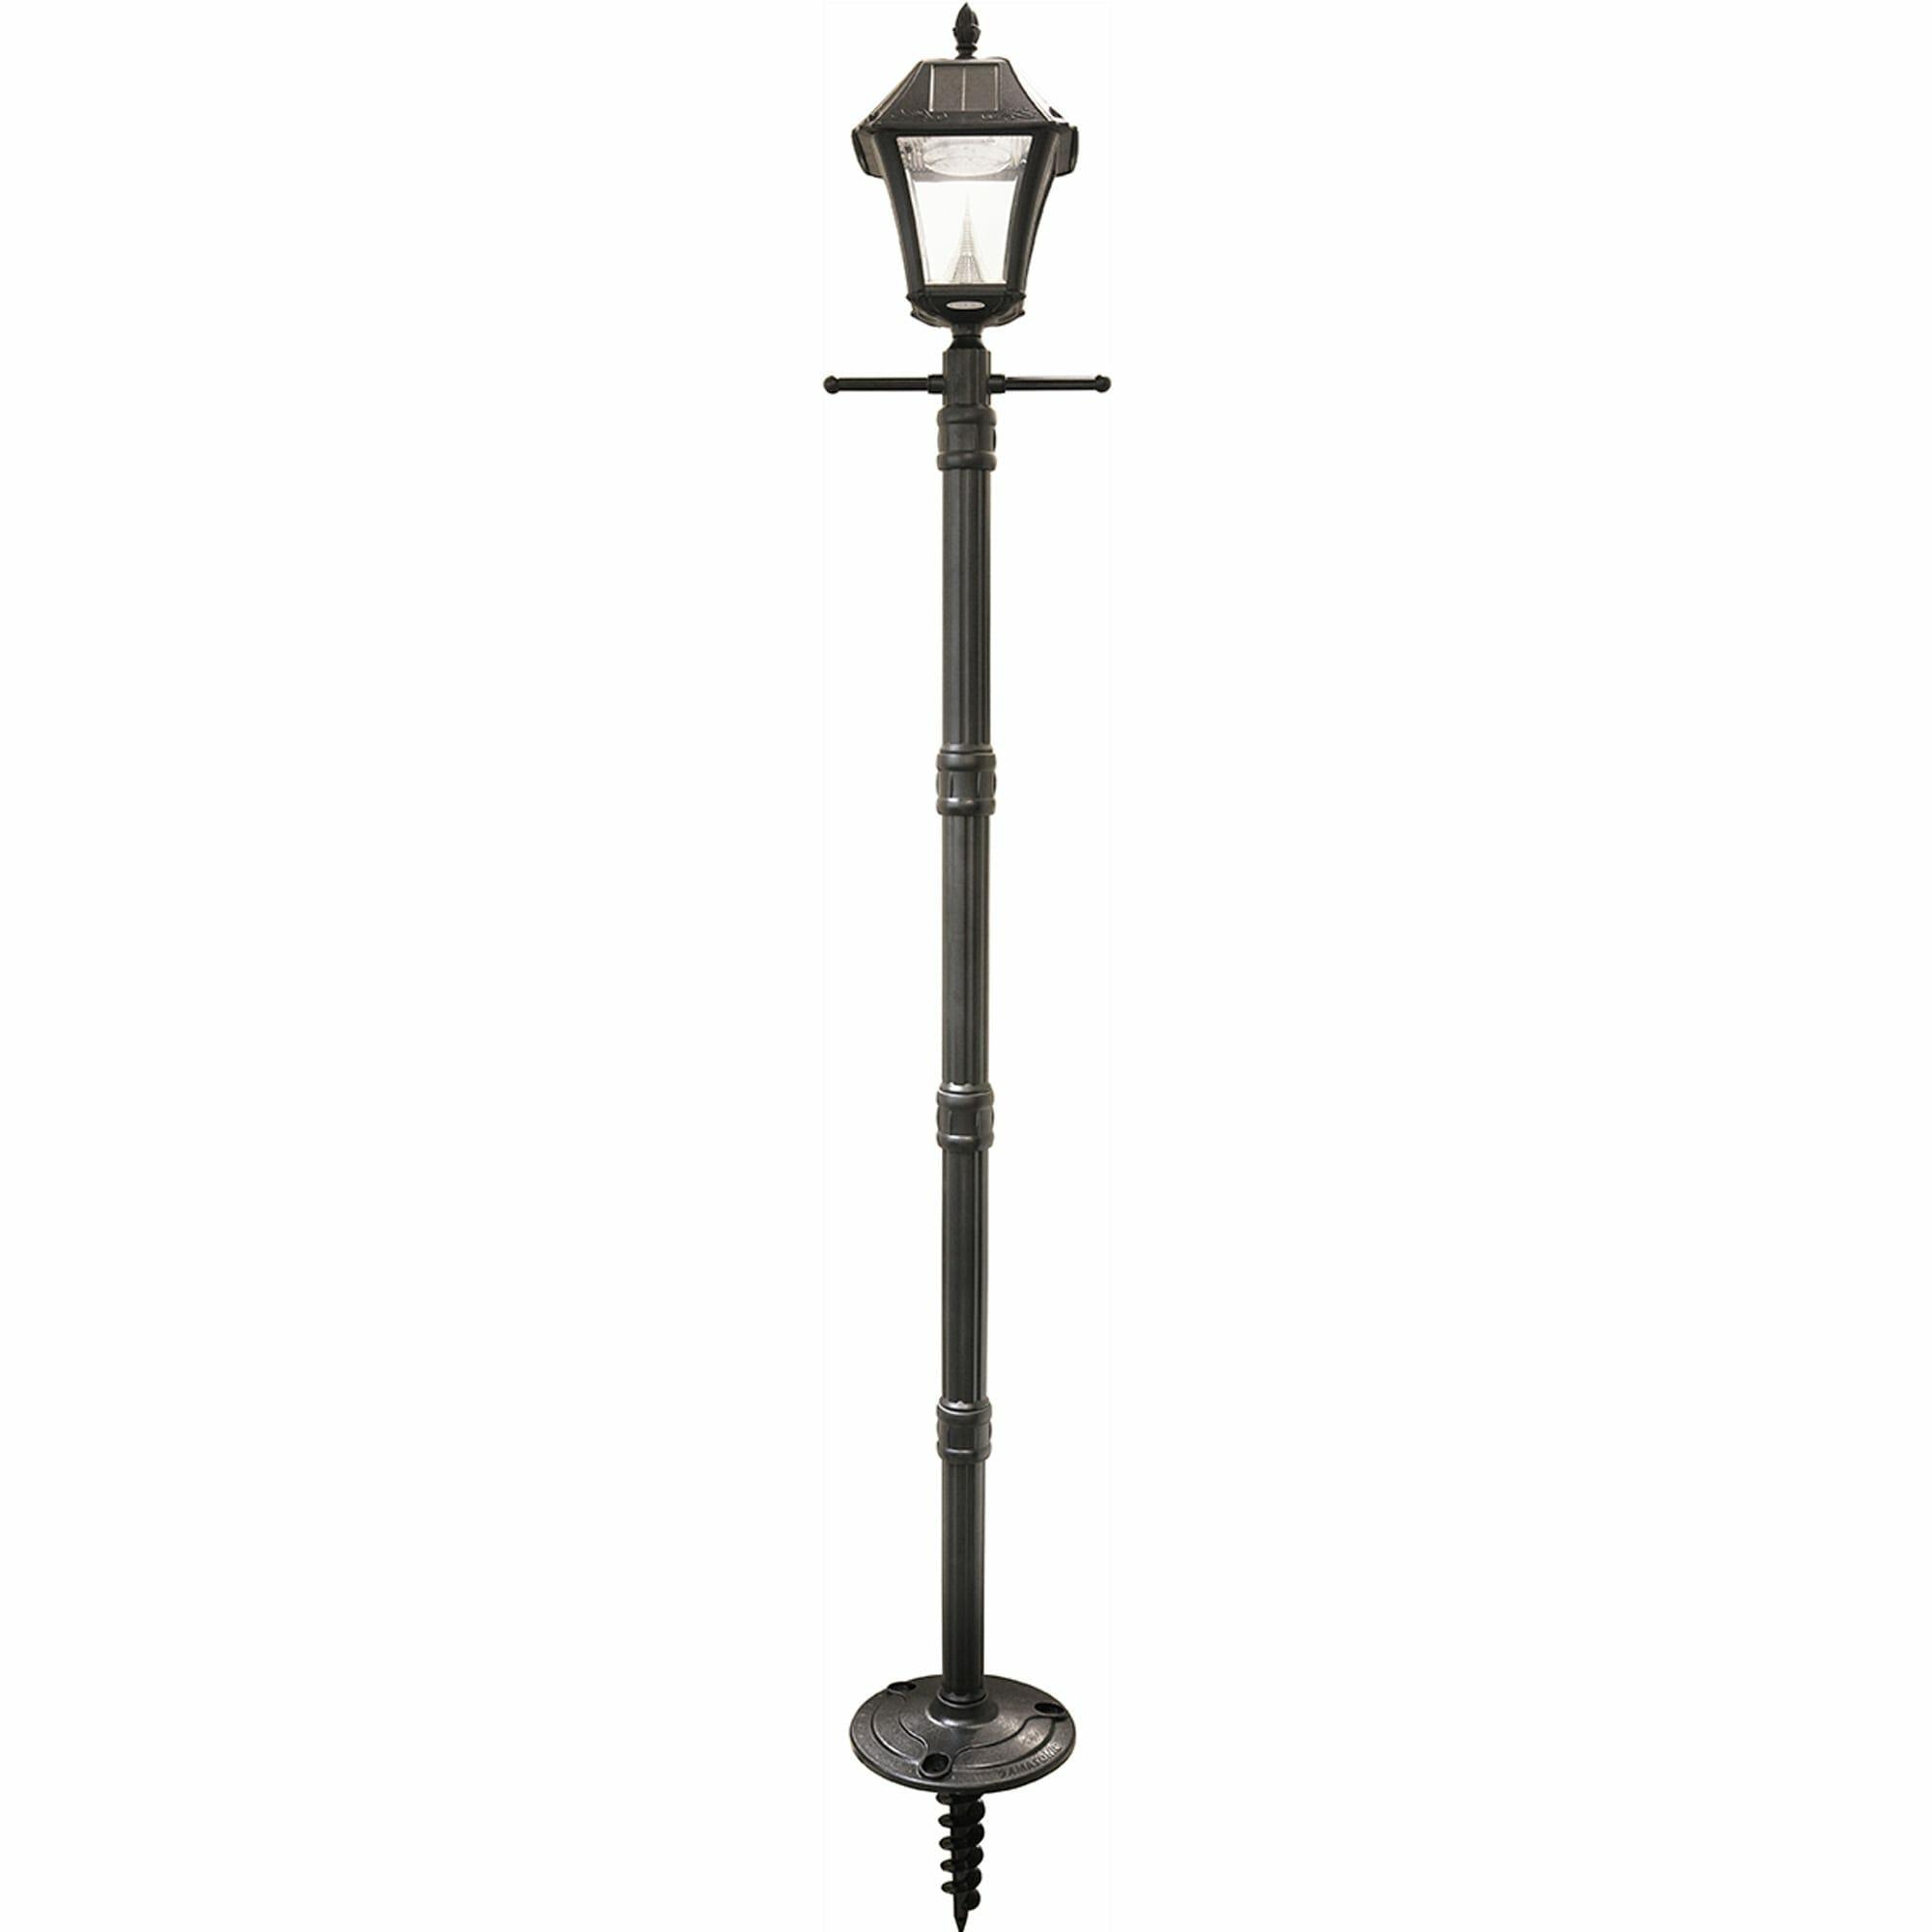 baytown-ii-solar-lamp-post-with-ez-anchor-base-single-lamp